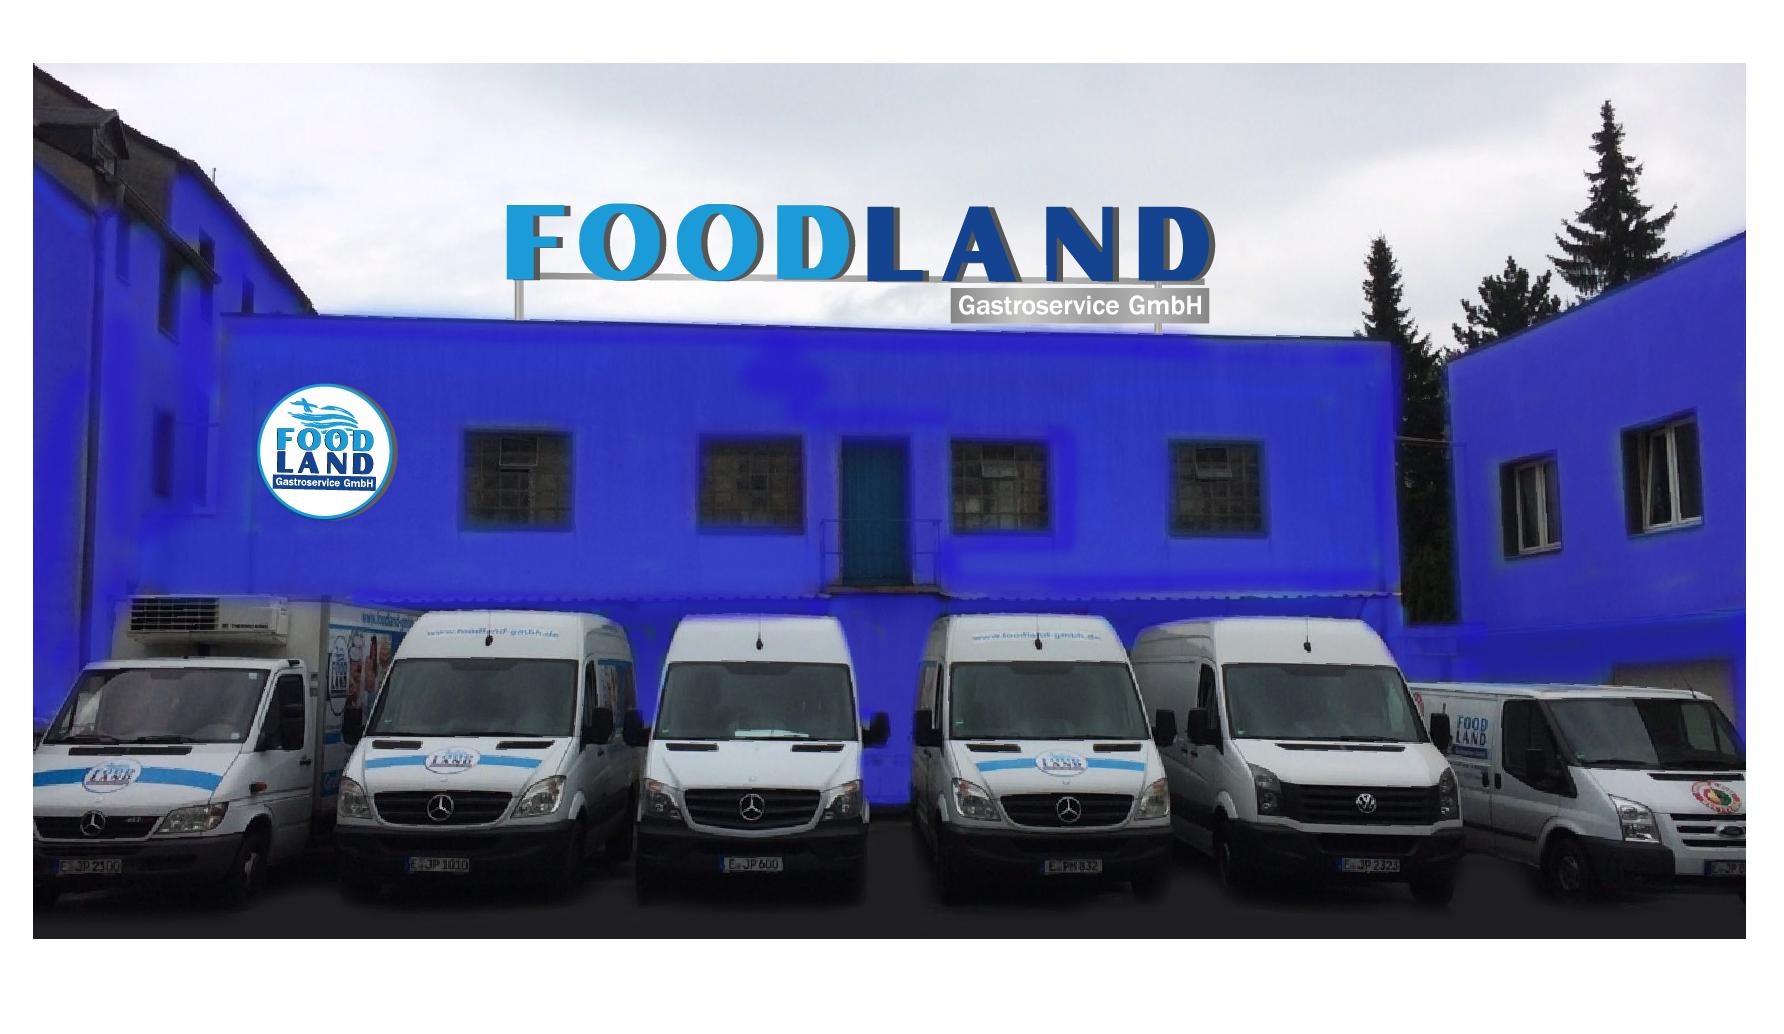 Foodland Gastroservice GmbH